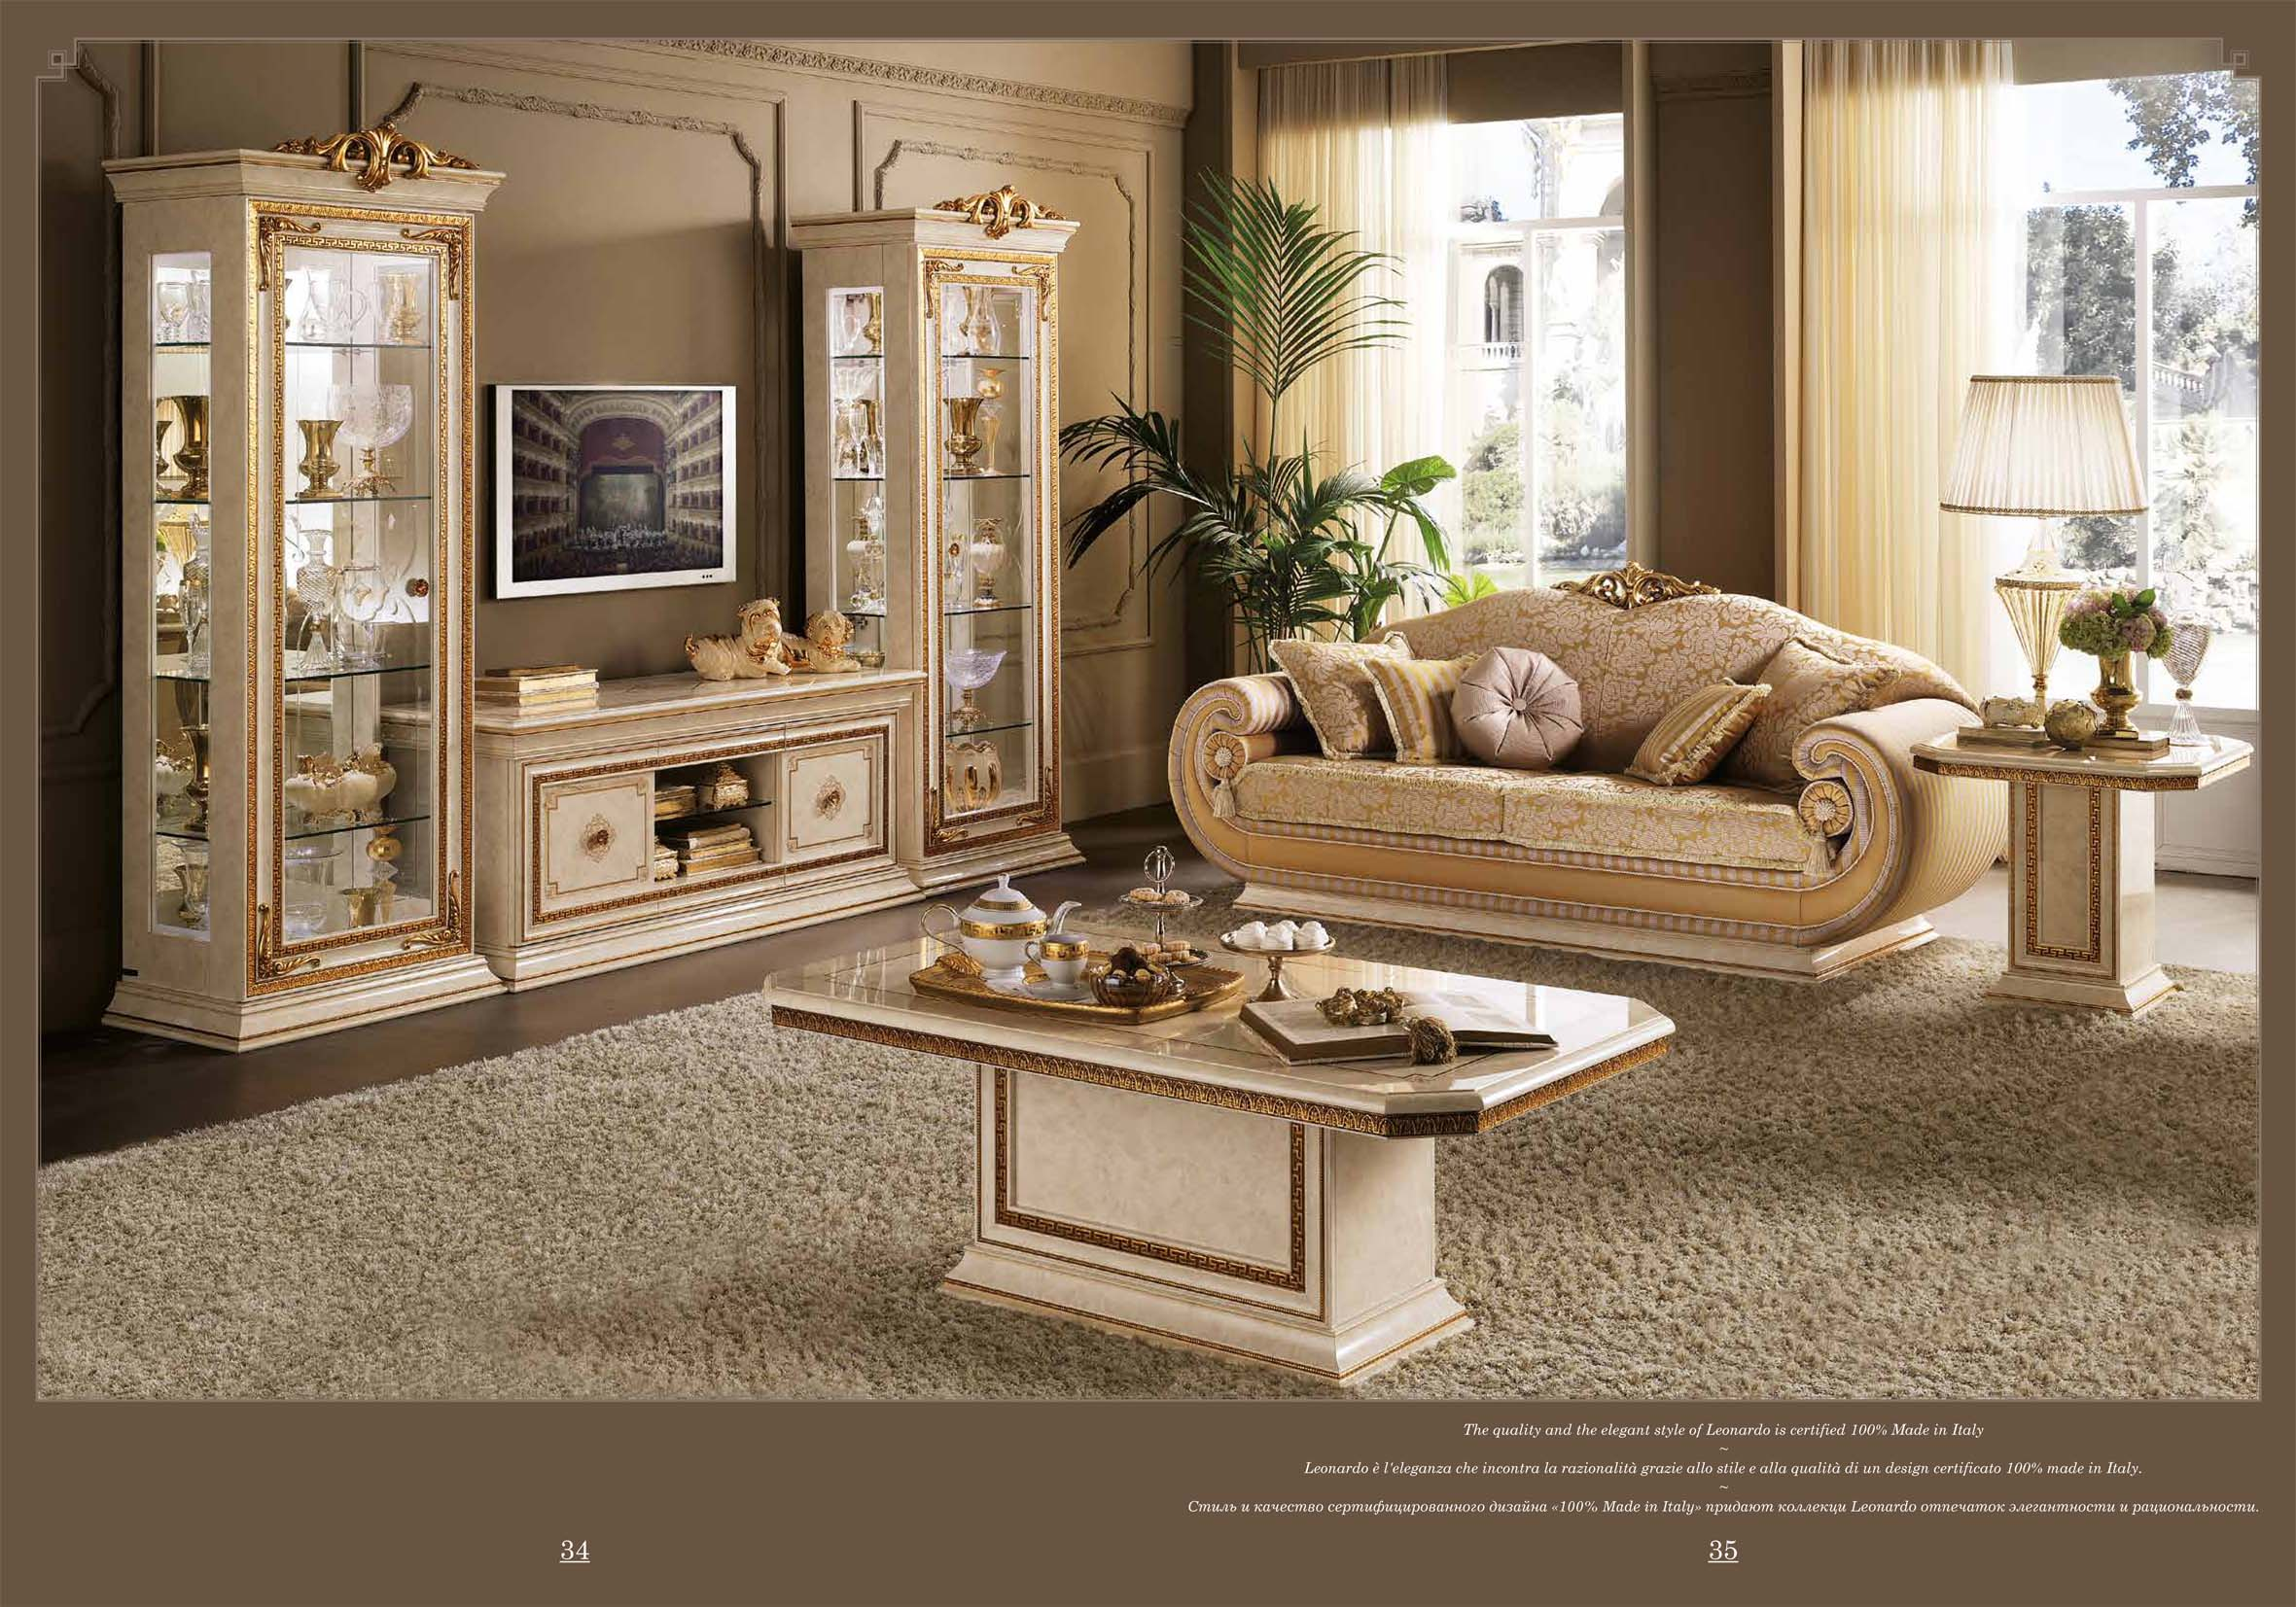 leonardo lounge arredoclassic living room italy collections. Black Bedroom Furniture Sets. Home Design Ideas